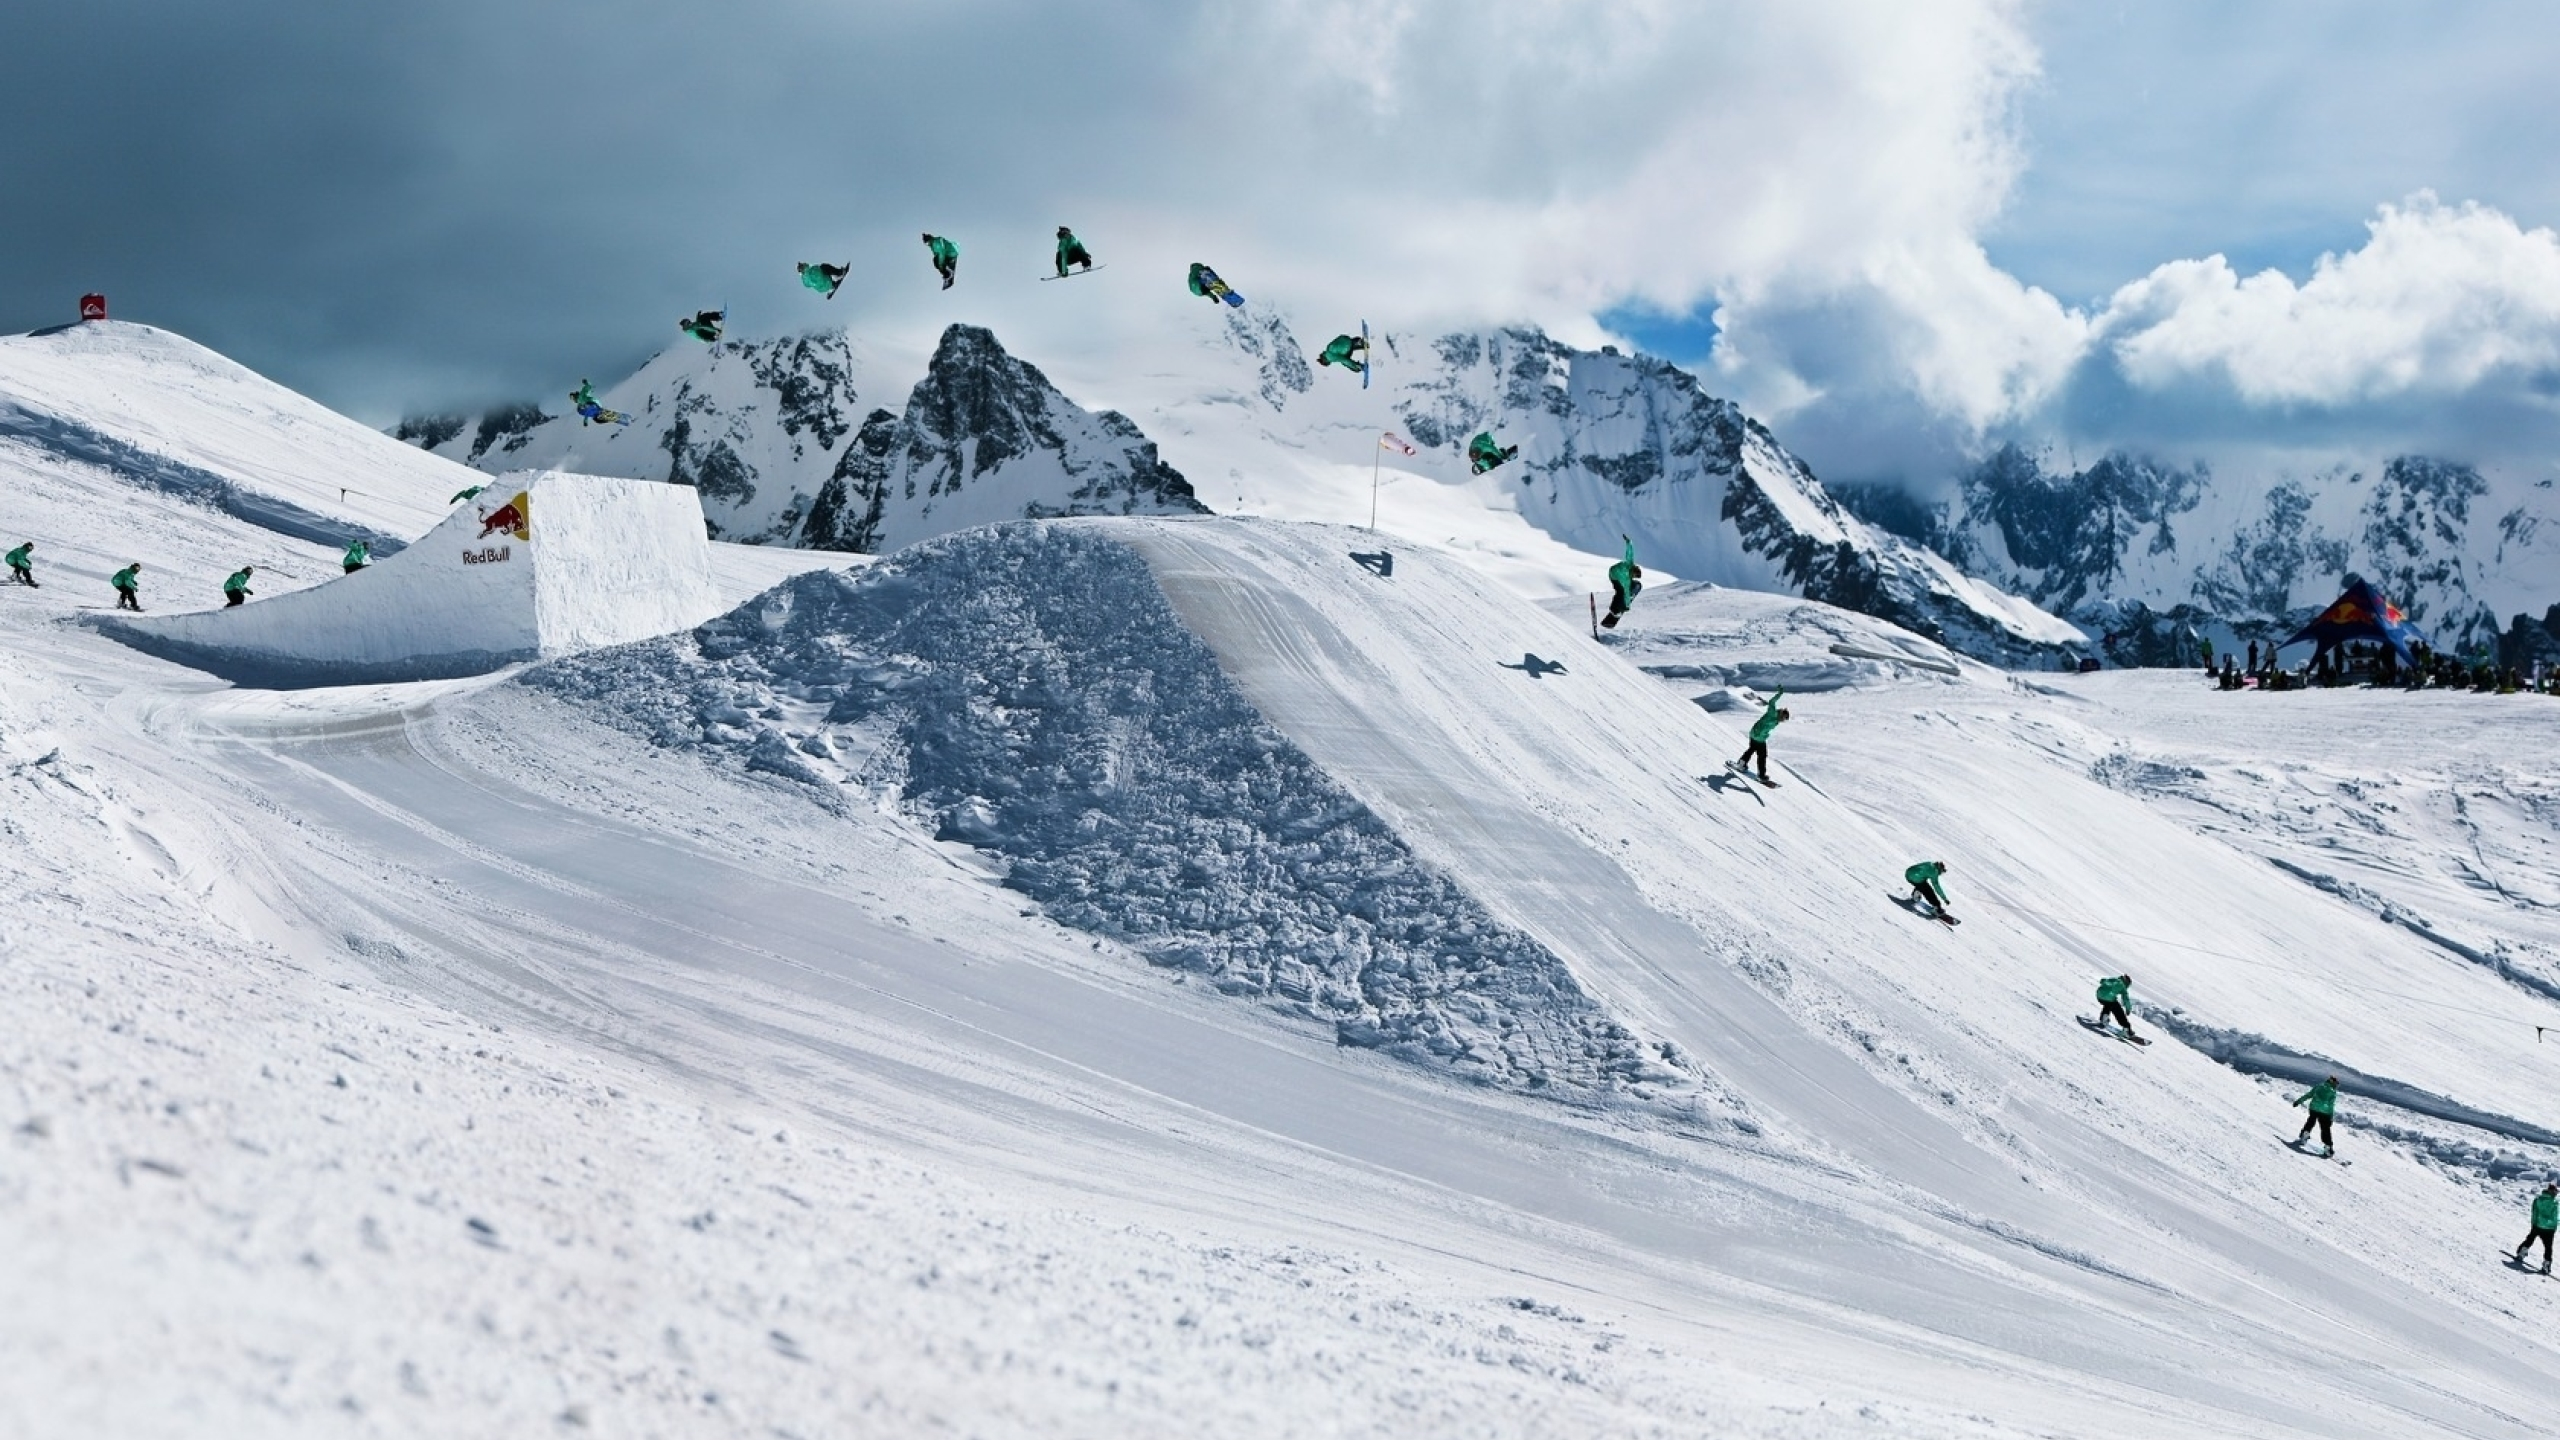 2560x1440 Snowboarding Red Bull Trick 1440p Resolution